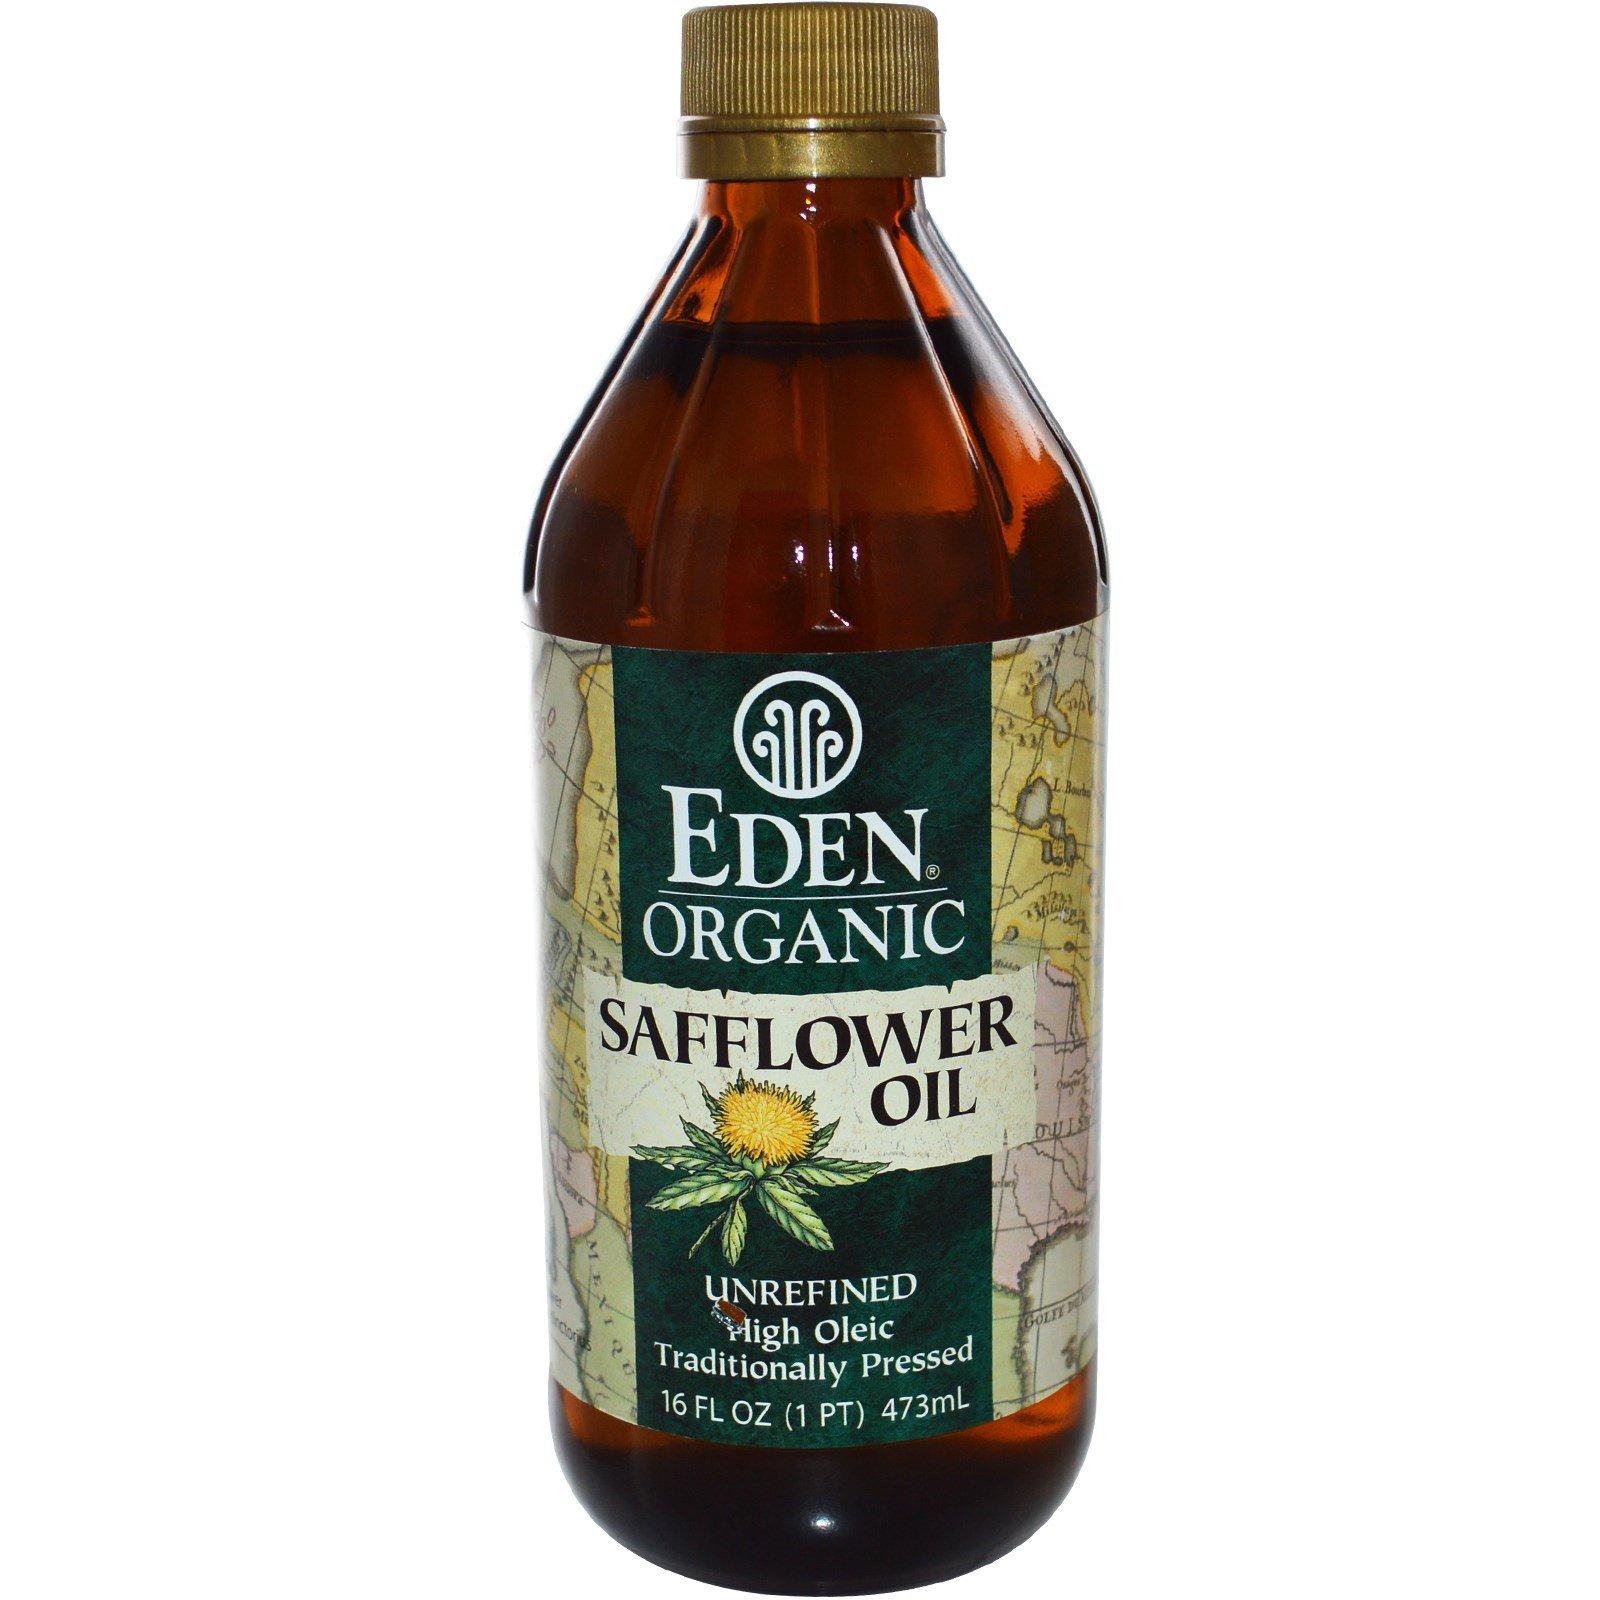 Eden Foods, Organic Safflower Oil, Unrefined, 16 fl oz (473 ml) - 3PC